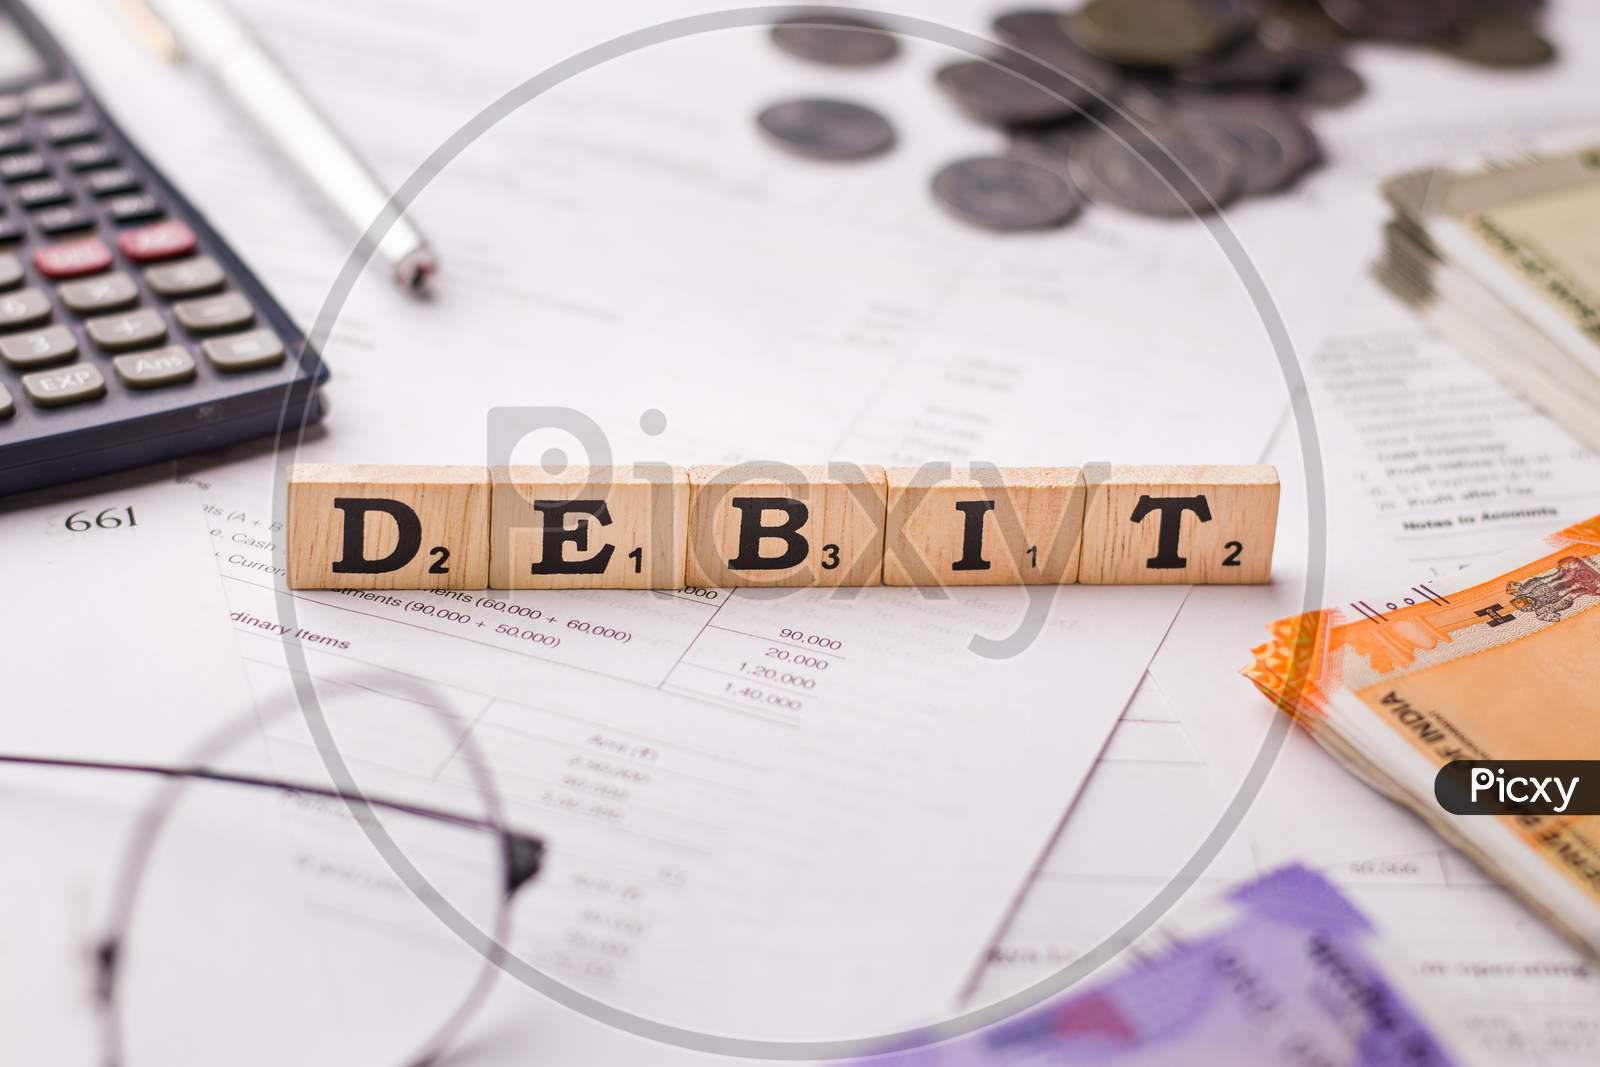 Assam, india - March 30, 2021 : Word DEBIT written on wooden cubes stock image.